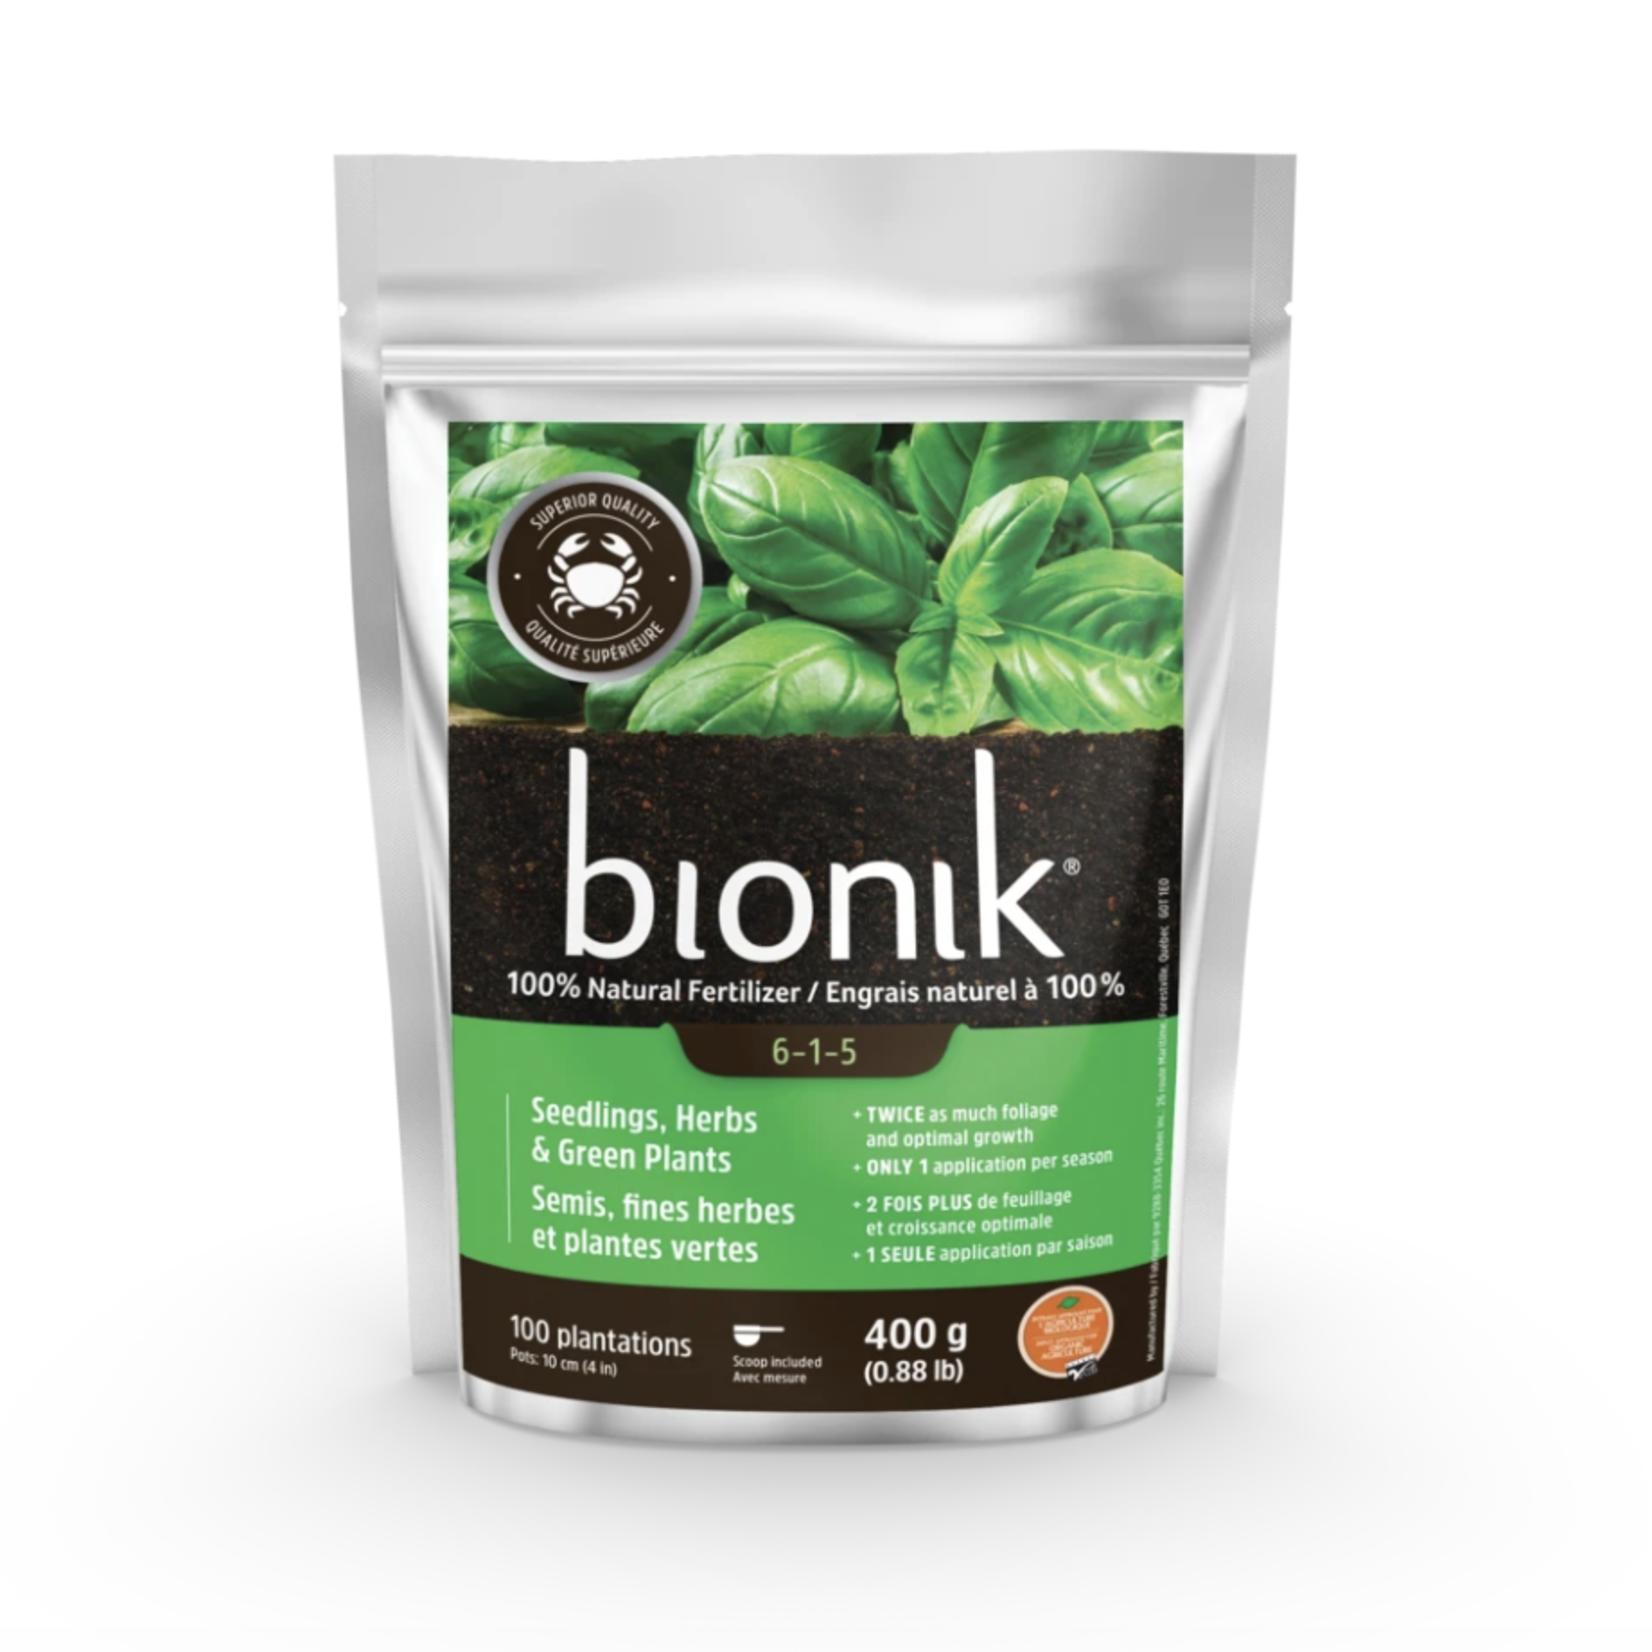 Bionik Semis, fines herbes et plantes vertes 400 g